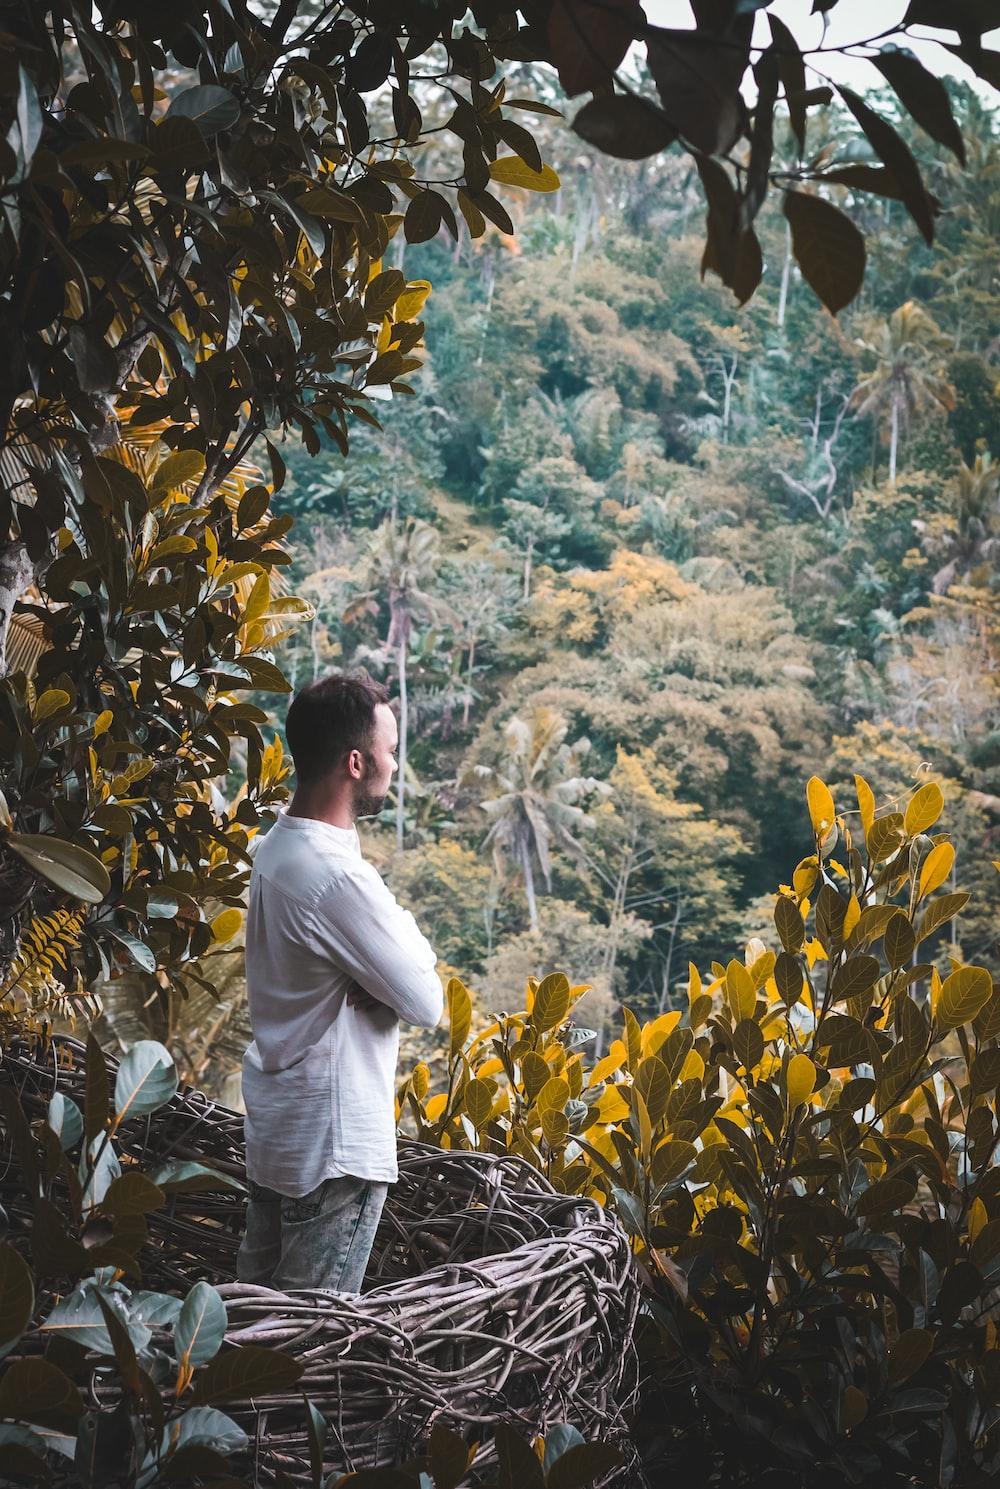 man in white dress shirt standing near green trees during daytime